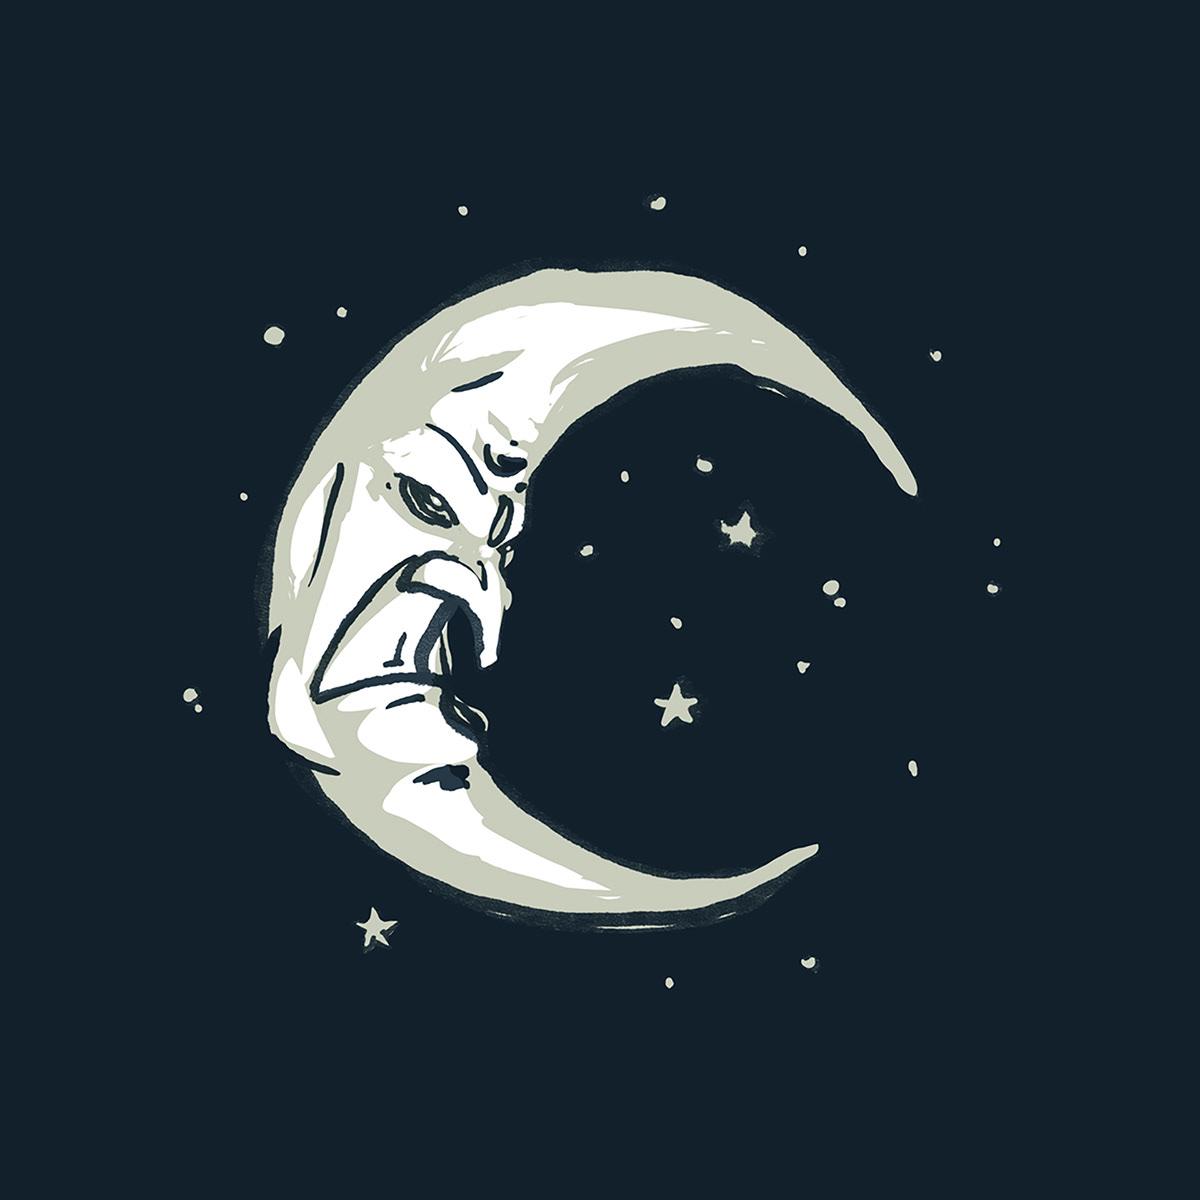 Image may contain: moon, illustration and cartoon